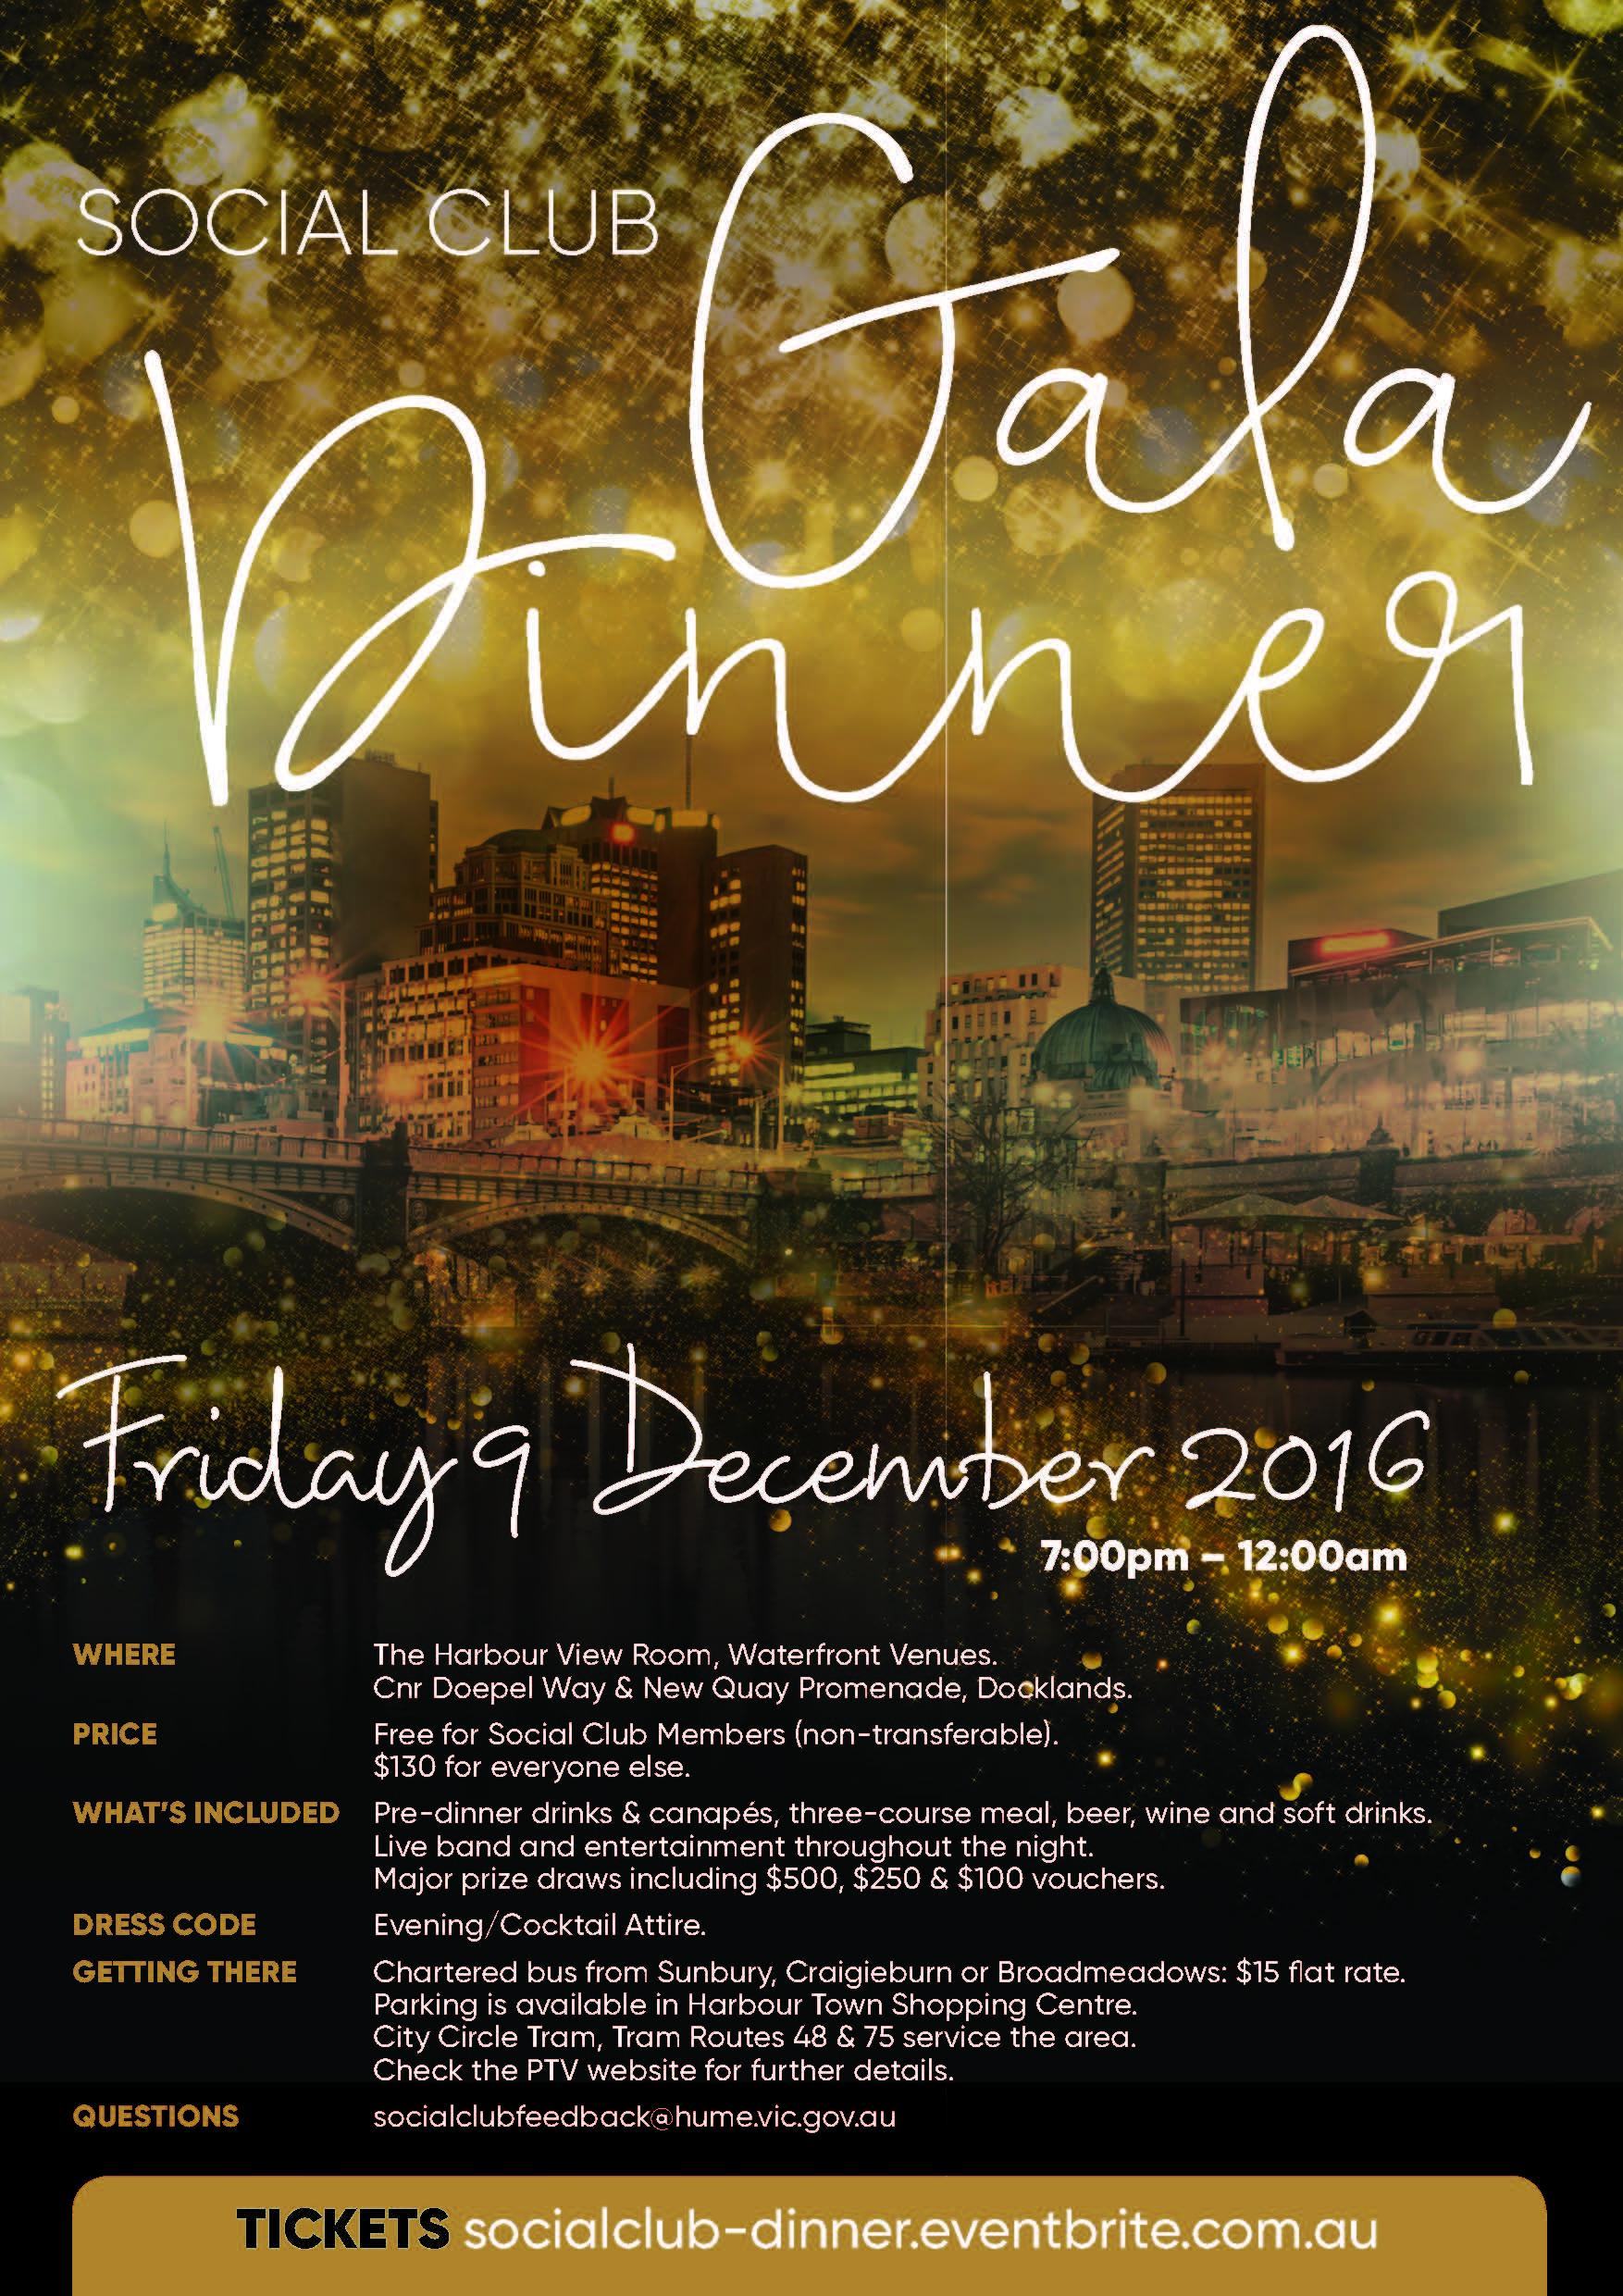 Social Club Gala Dinner Flyer